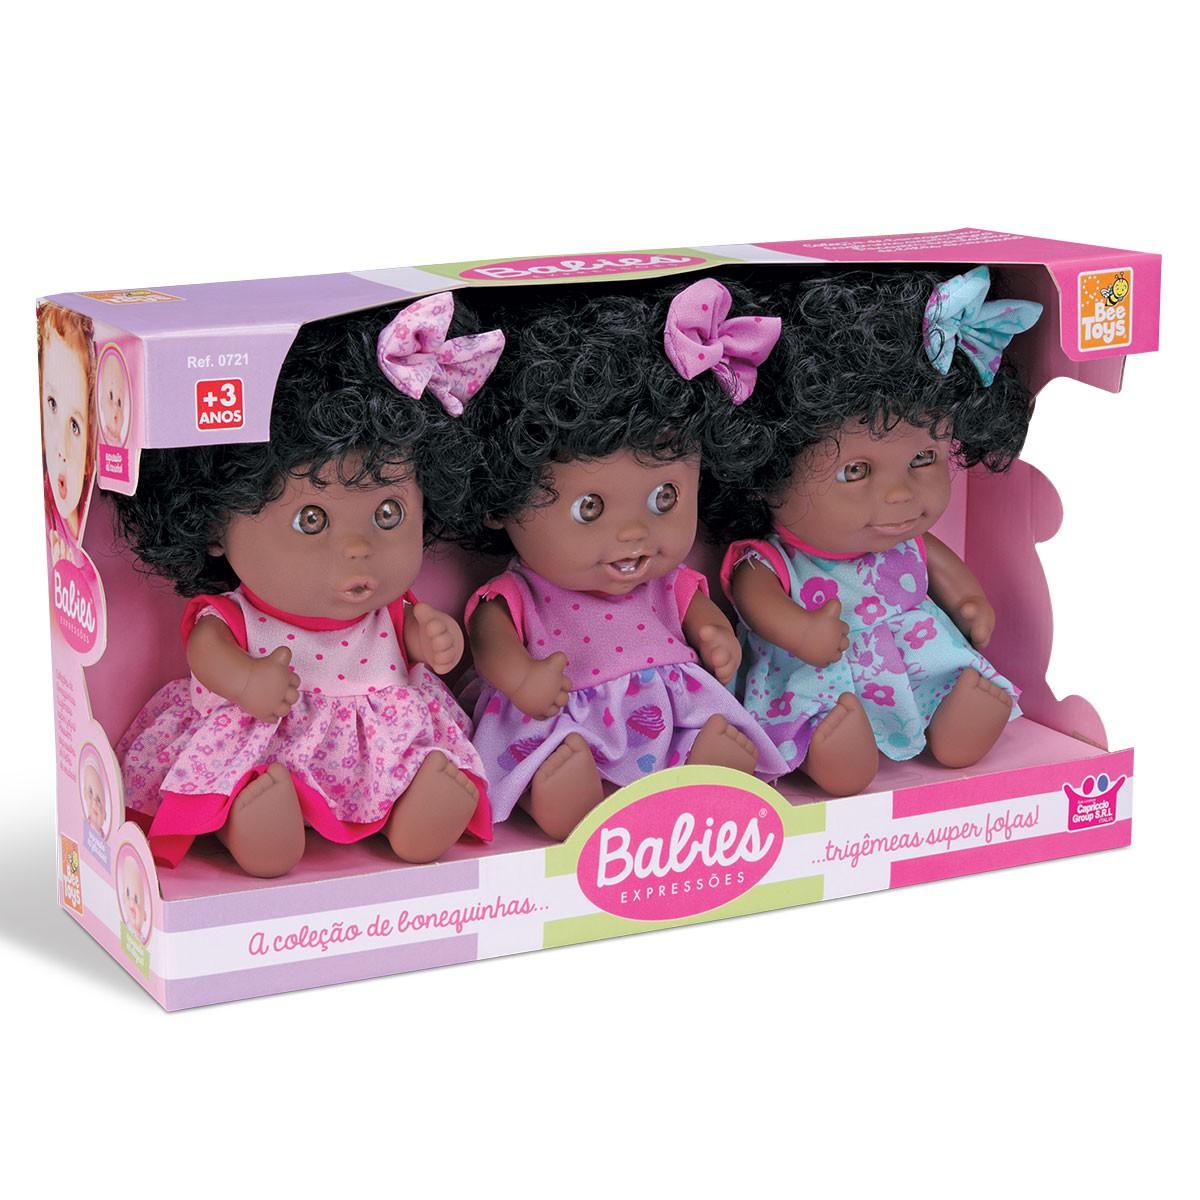 Bonecas Babies Expressões Trigêmeas Negra Vinil Bee Toys